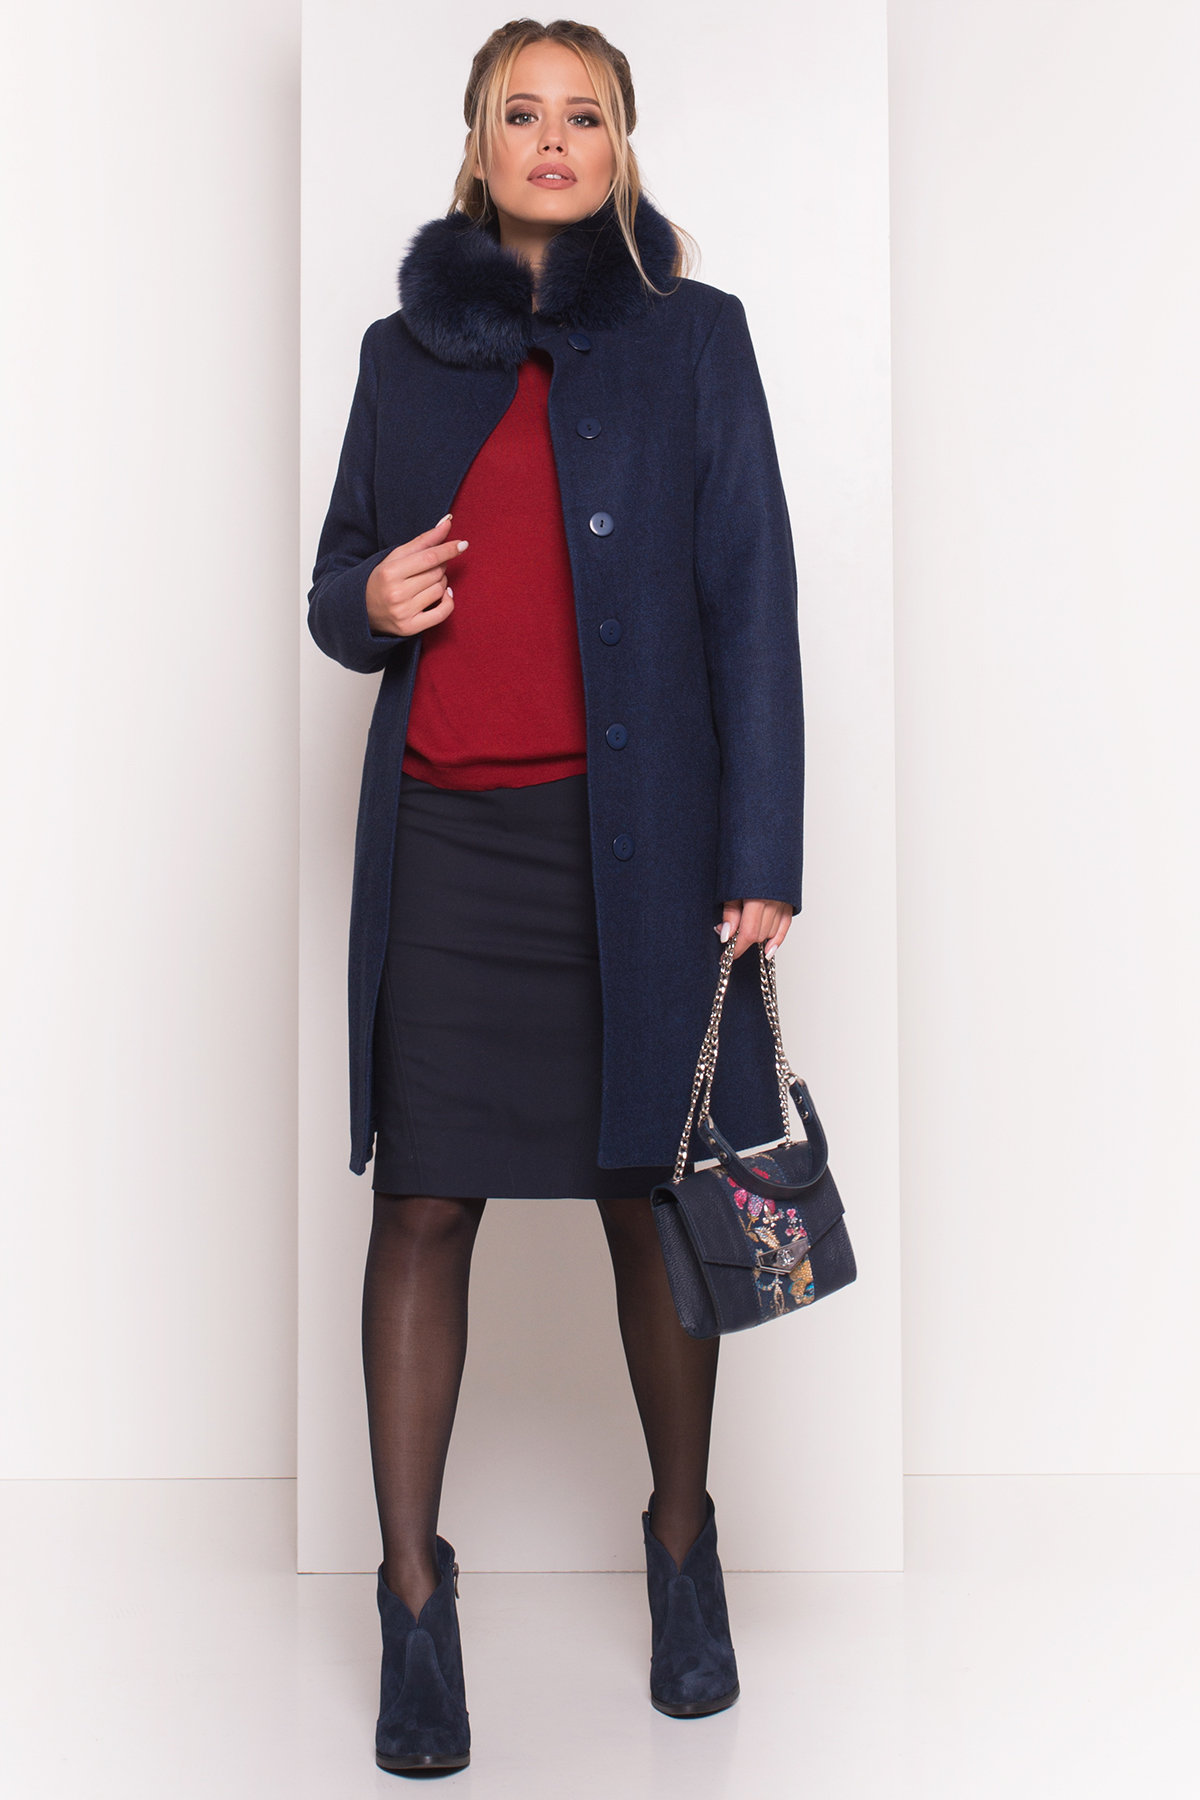 Пальто зима Люцея 5513 АРТ. 37046 Цвет: Темно-синий 17 - фото 3, интернет магазин tm-modus.ru